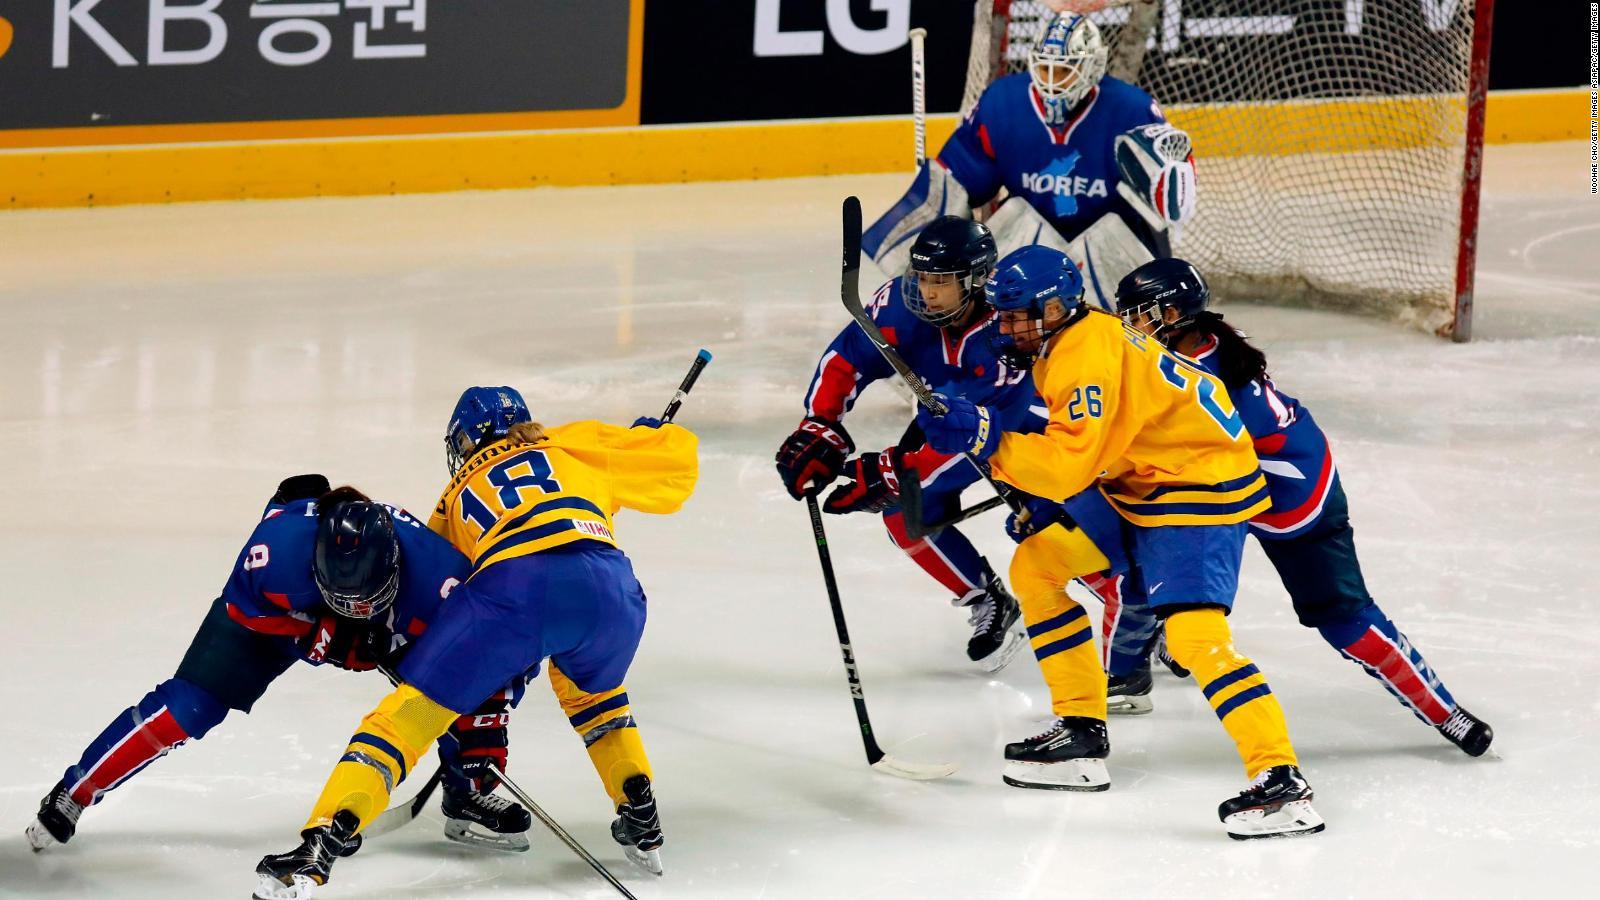 Joint Korean Ice Hockey Team Play For First Time Cnn